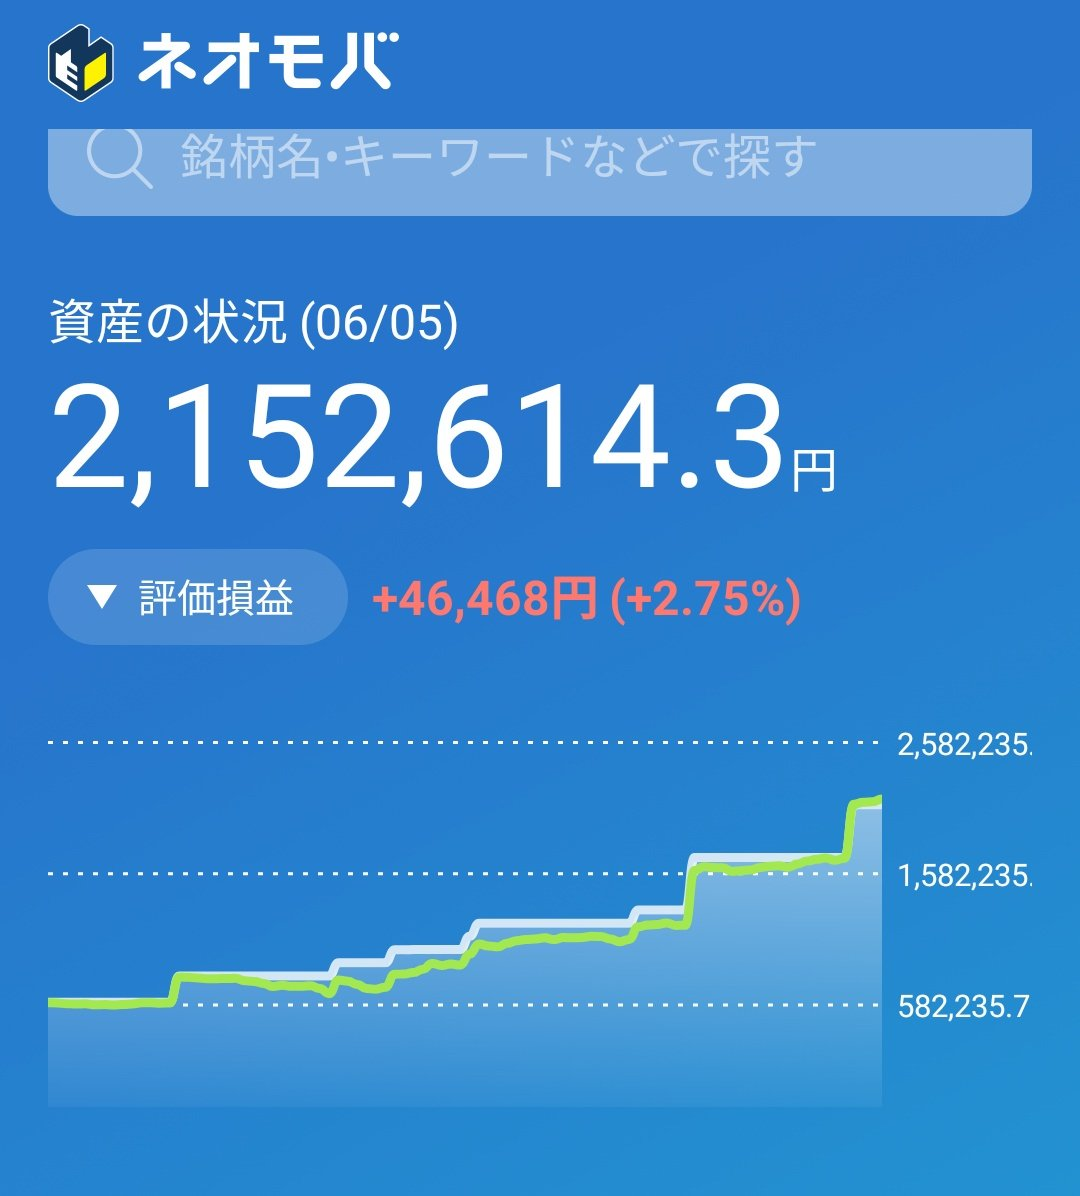 test ツイッターメディア - 買えば上がる天国モード✨  日本株は、以下の方針  ・楽天証券で保有の単元株はある程度の利益出たら利確 ・ネオモバはちょこちょこ追加で購入  オートバックスの後場の上げは何だったんだろ❔ #ネオモバ https://t.co/TH5LyGi06h